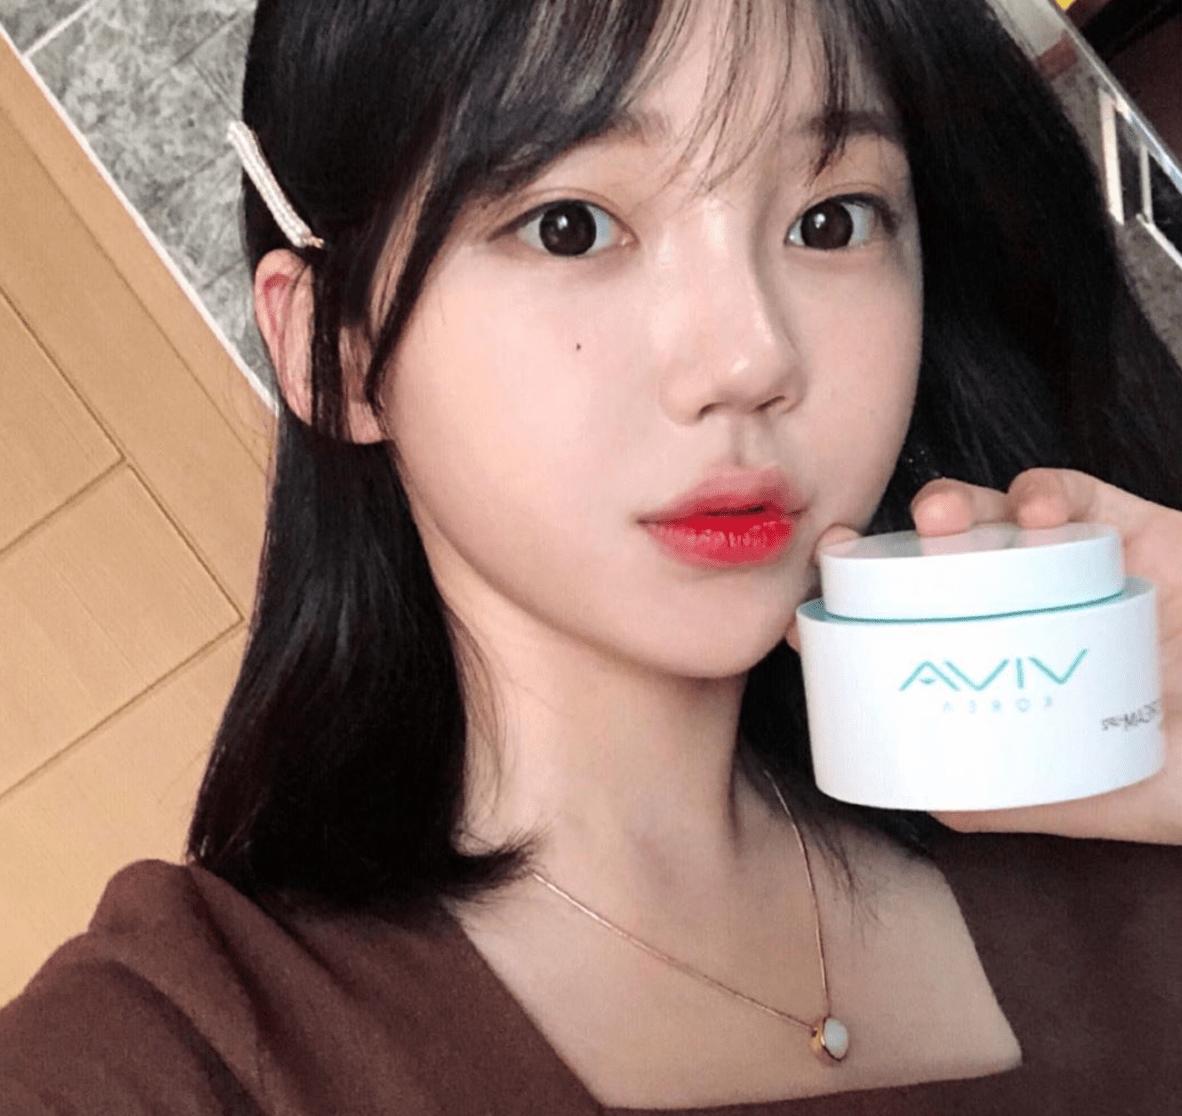 korean-instagram-influencer-social-media-model-nyong99u-4.png